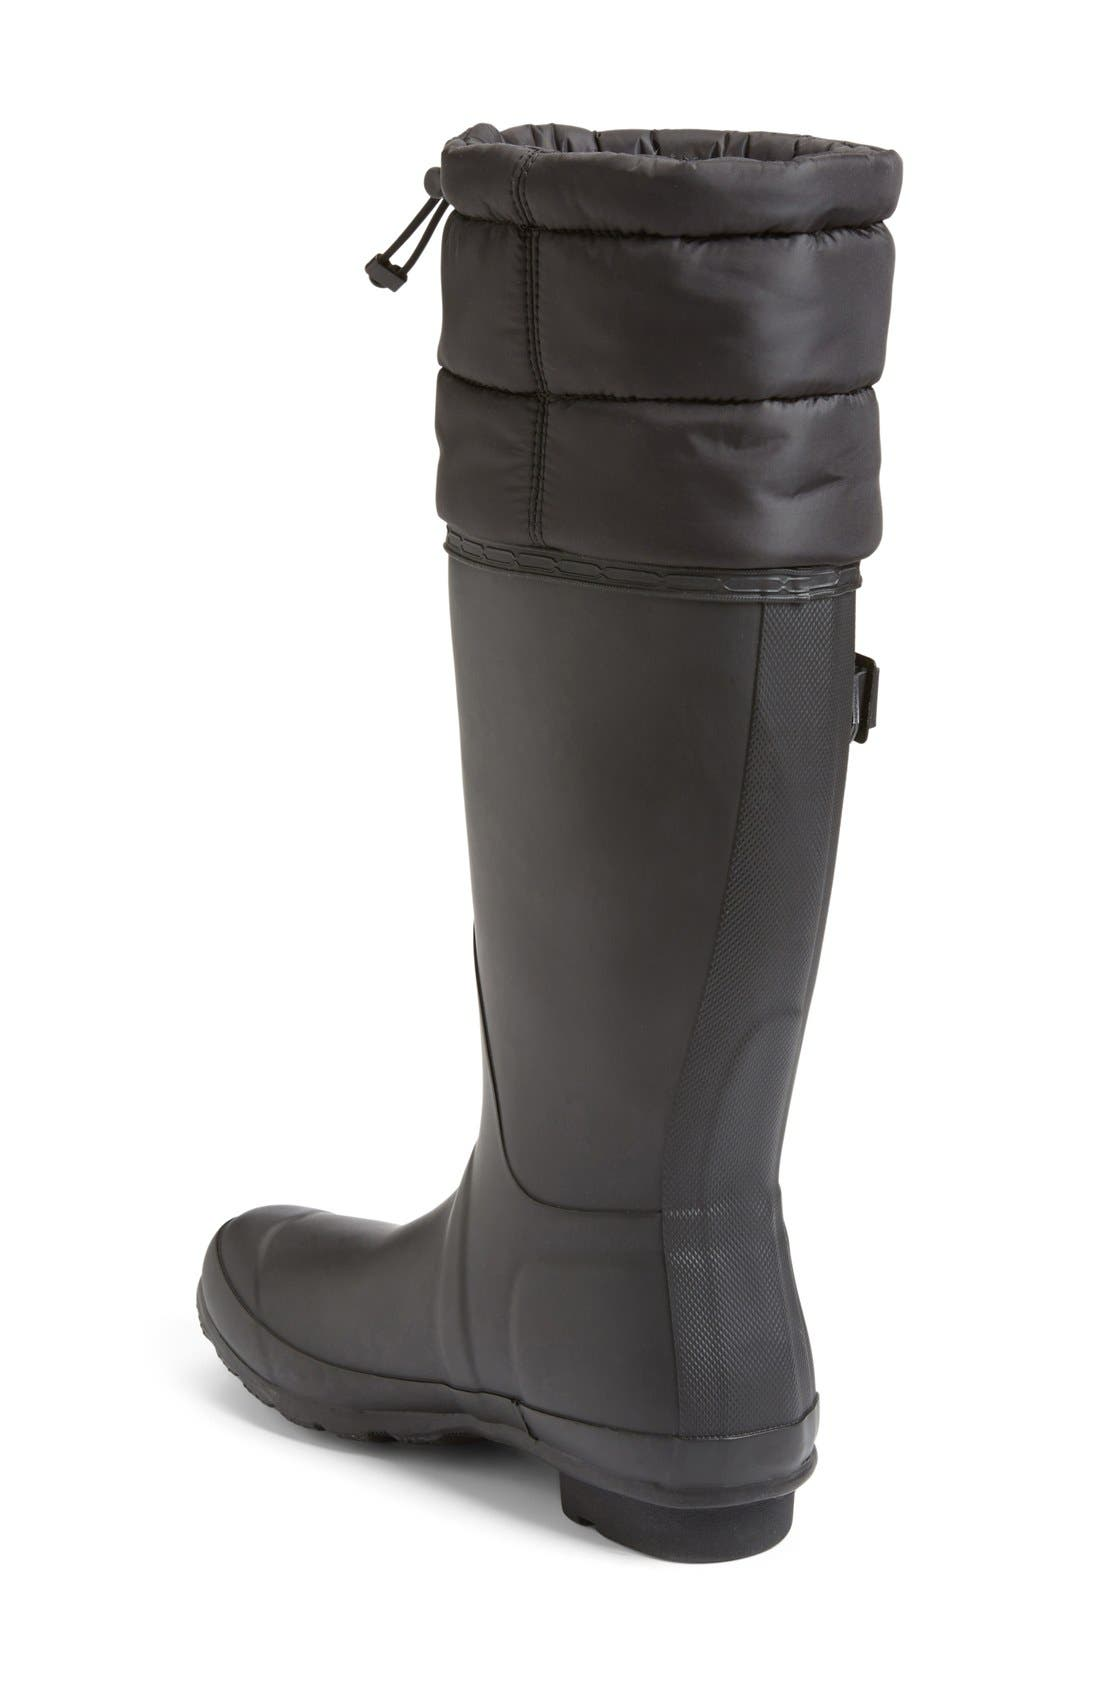 Alternate Image 2  - Hunter 'Original - Quilted Cuff' Rain Boot (Women)